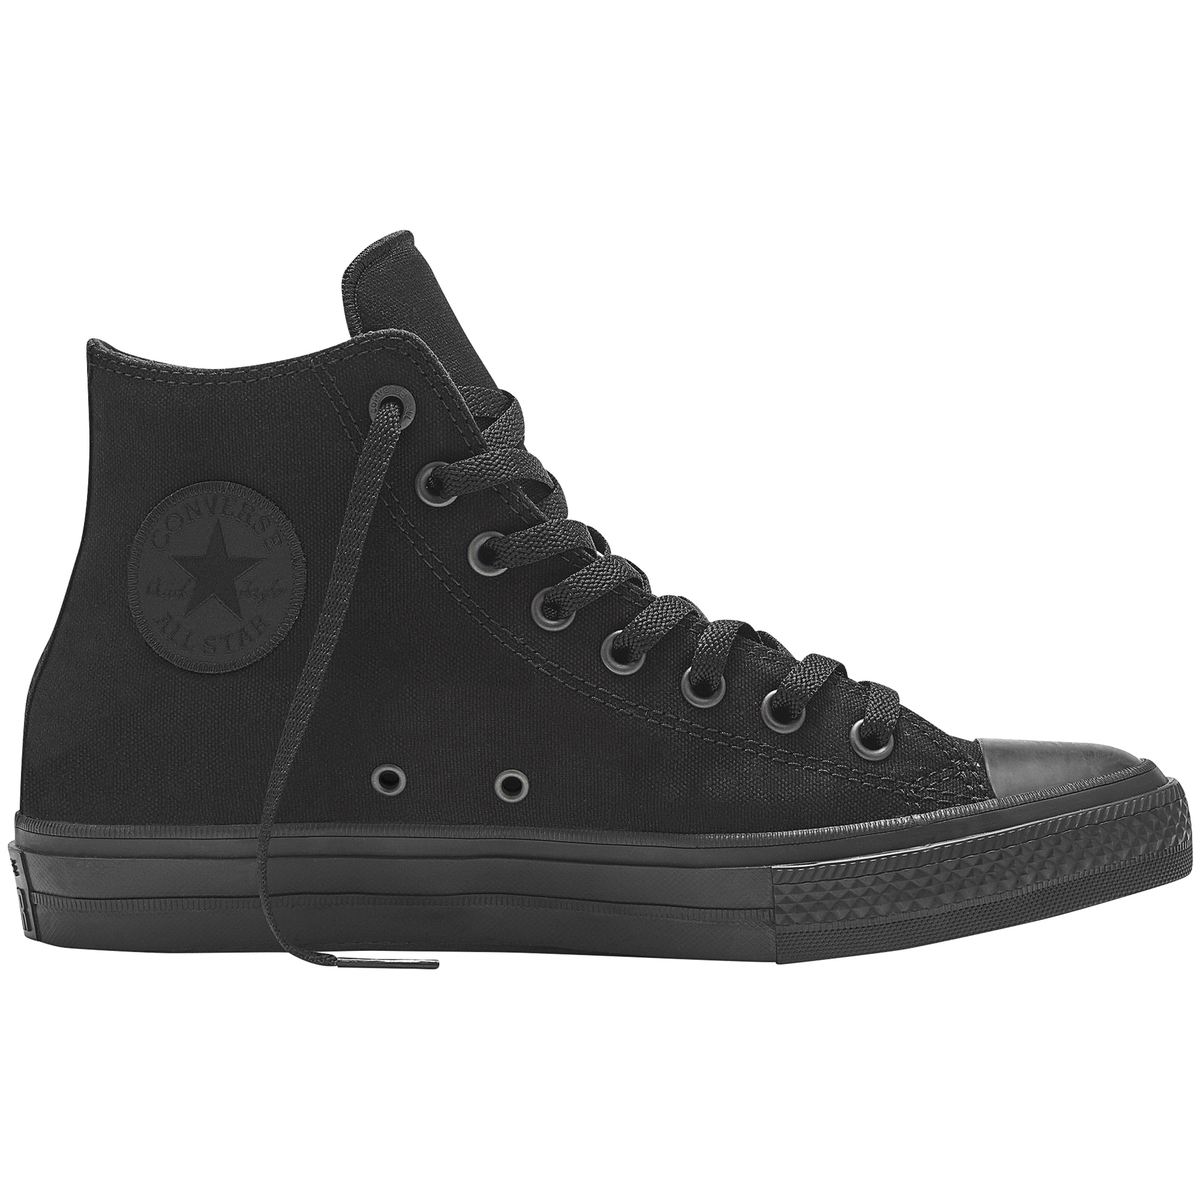 premium selection e4492 c0834 svart converse chuck taylor all star ii mono hi black fritidsskor    sneakers herr